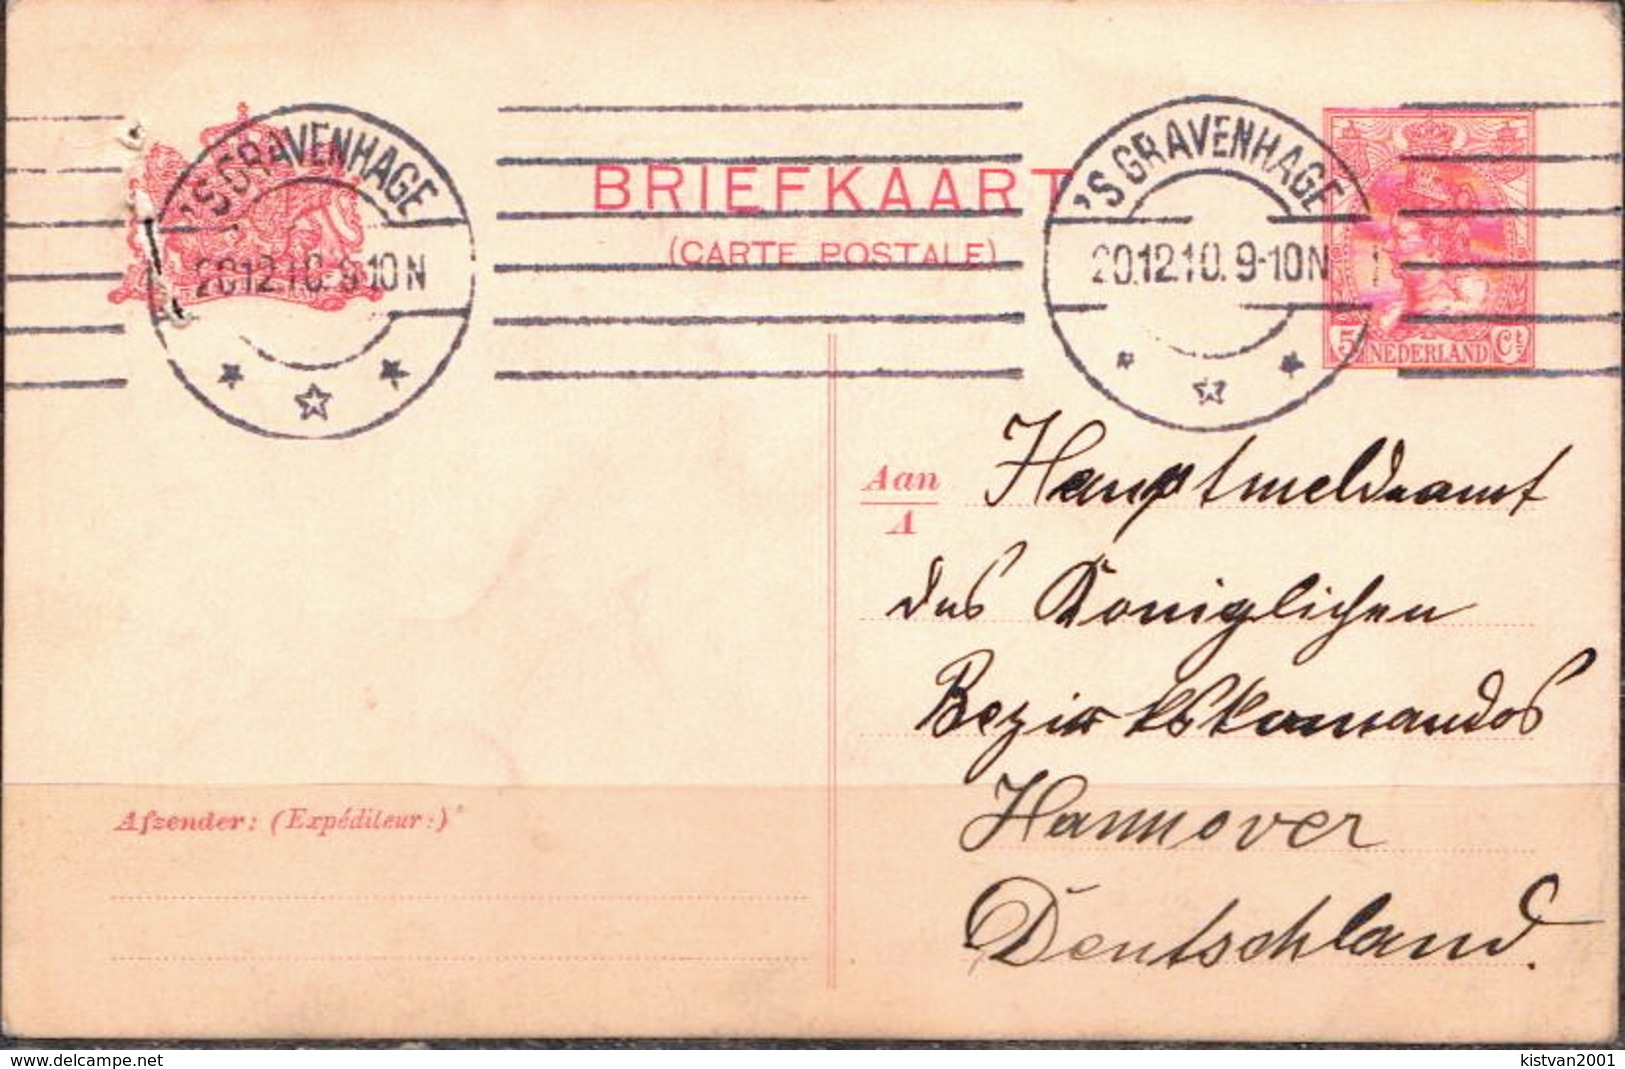 Postal History: Netherlands Postal Stationary From 1910 - Postal Stationery